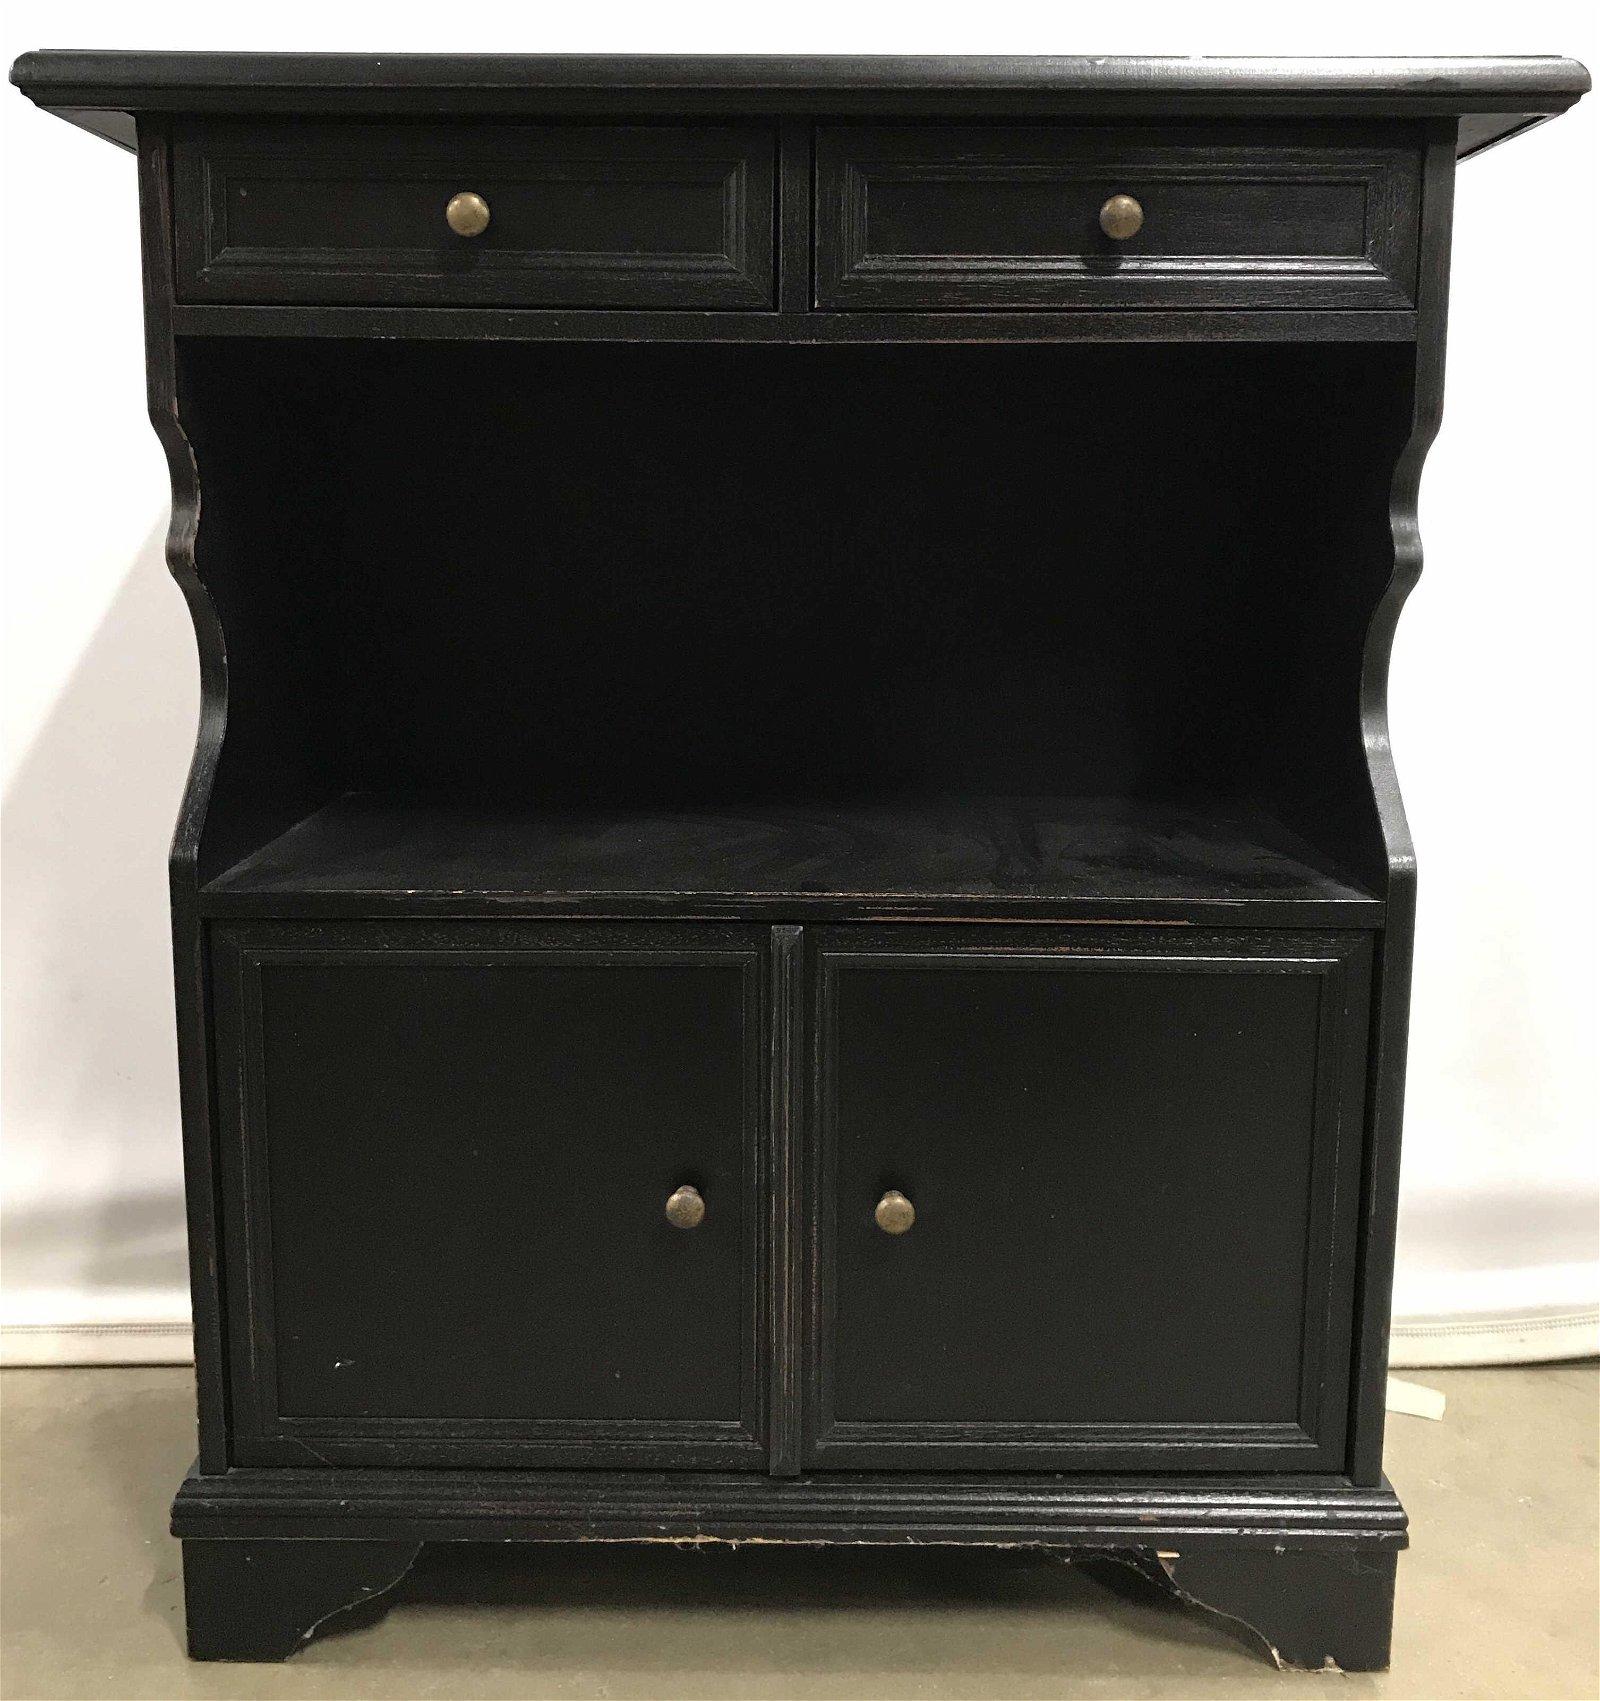 BALLARD DESIGN Black tnd Wood Cabinet Side Table